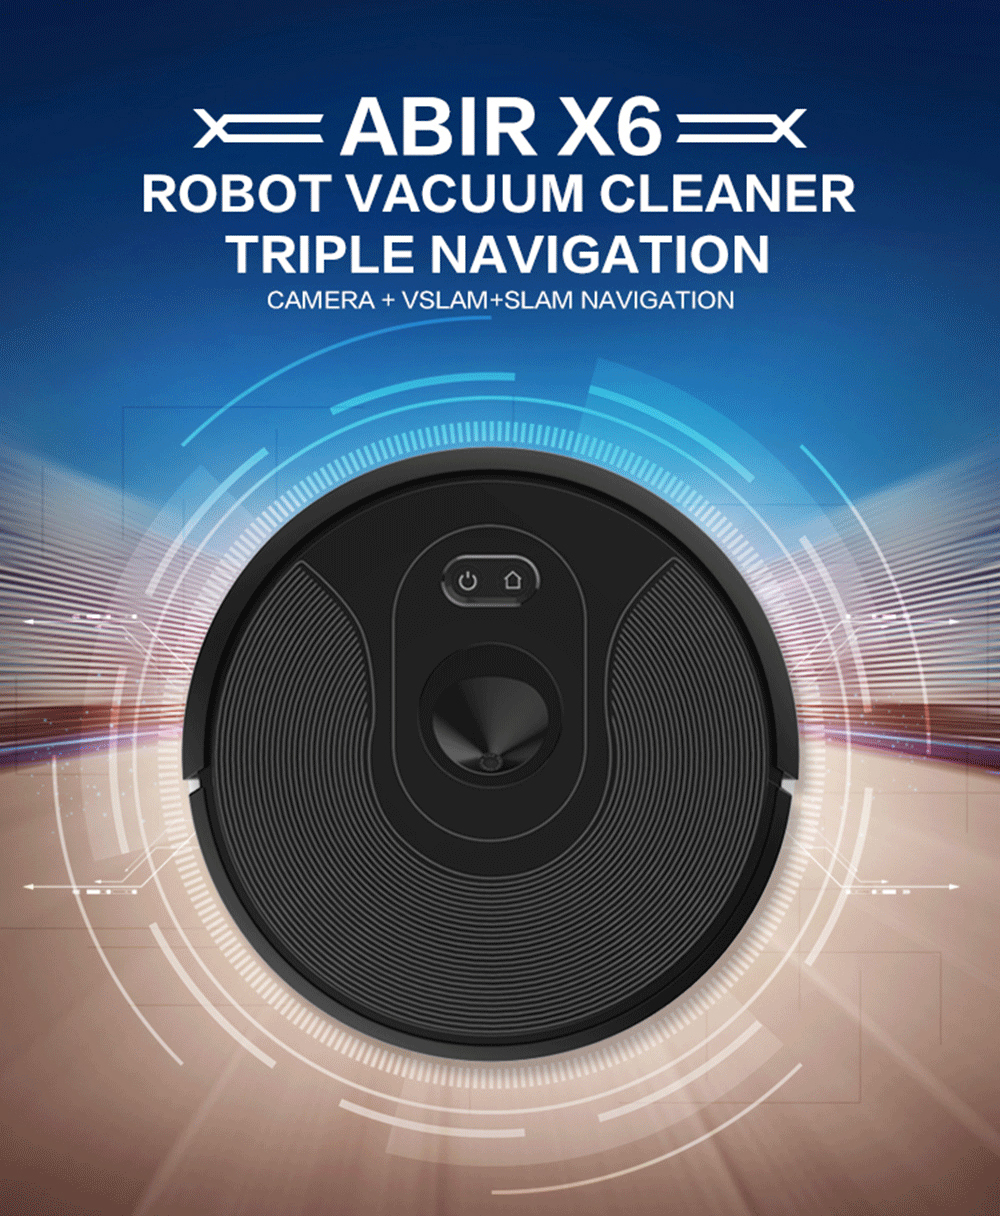 HTB1TeFva2WG3KVjSZPcq6zkbXXal ABIR Robot Vacuum Cleaner x6 with Camera Navigation,Smart Memory,Hand Draw Virtual Blocker,Low Noise,Intelligent Big Water Tank